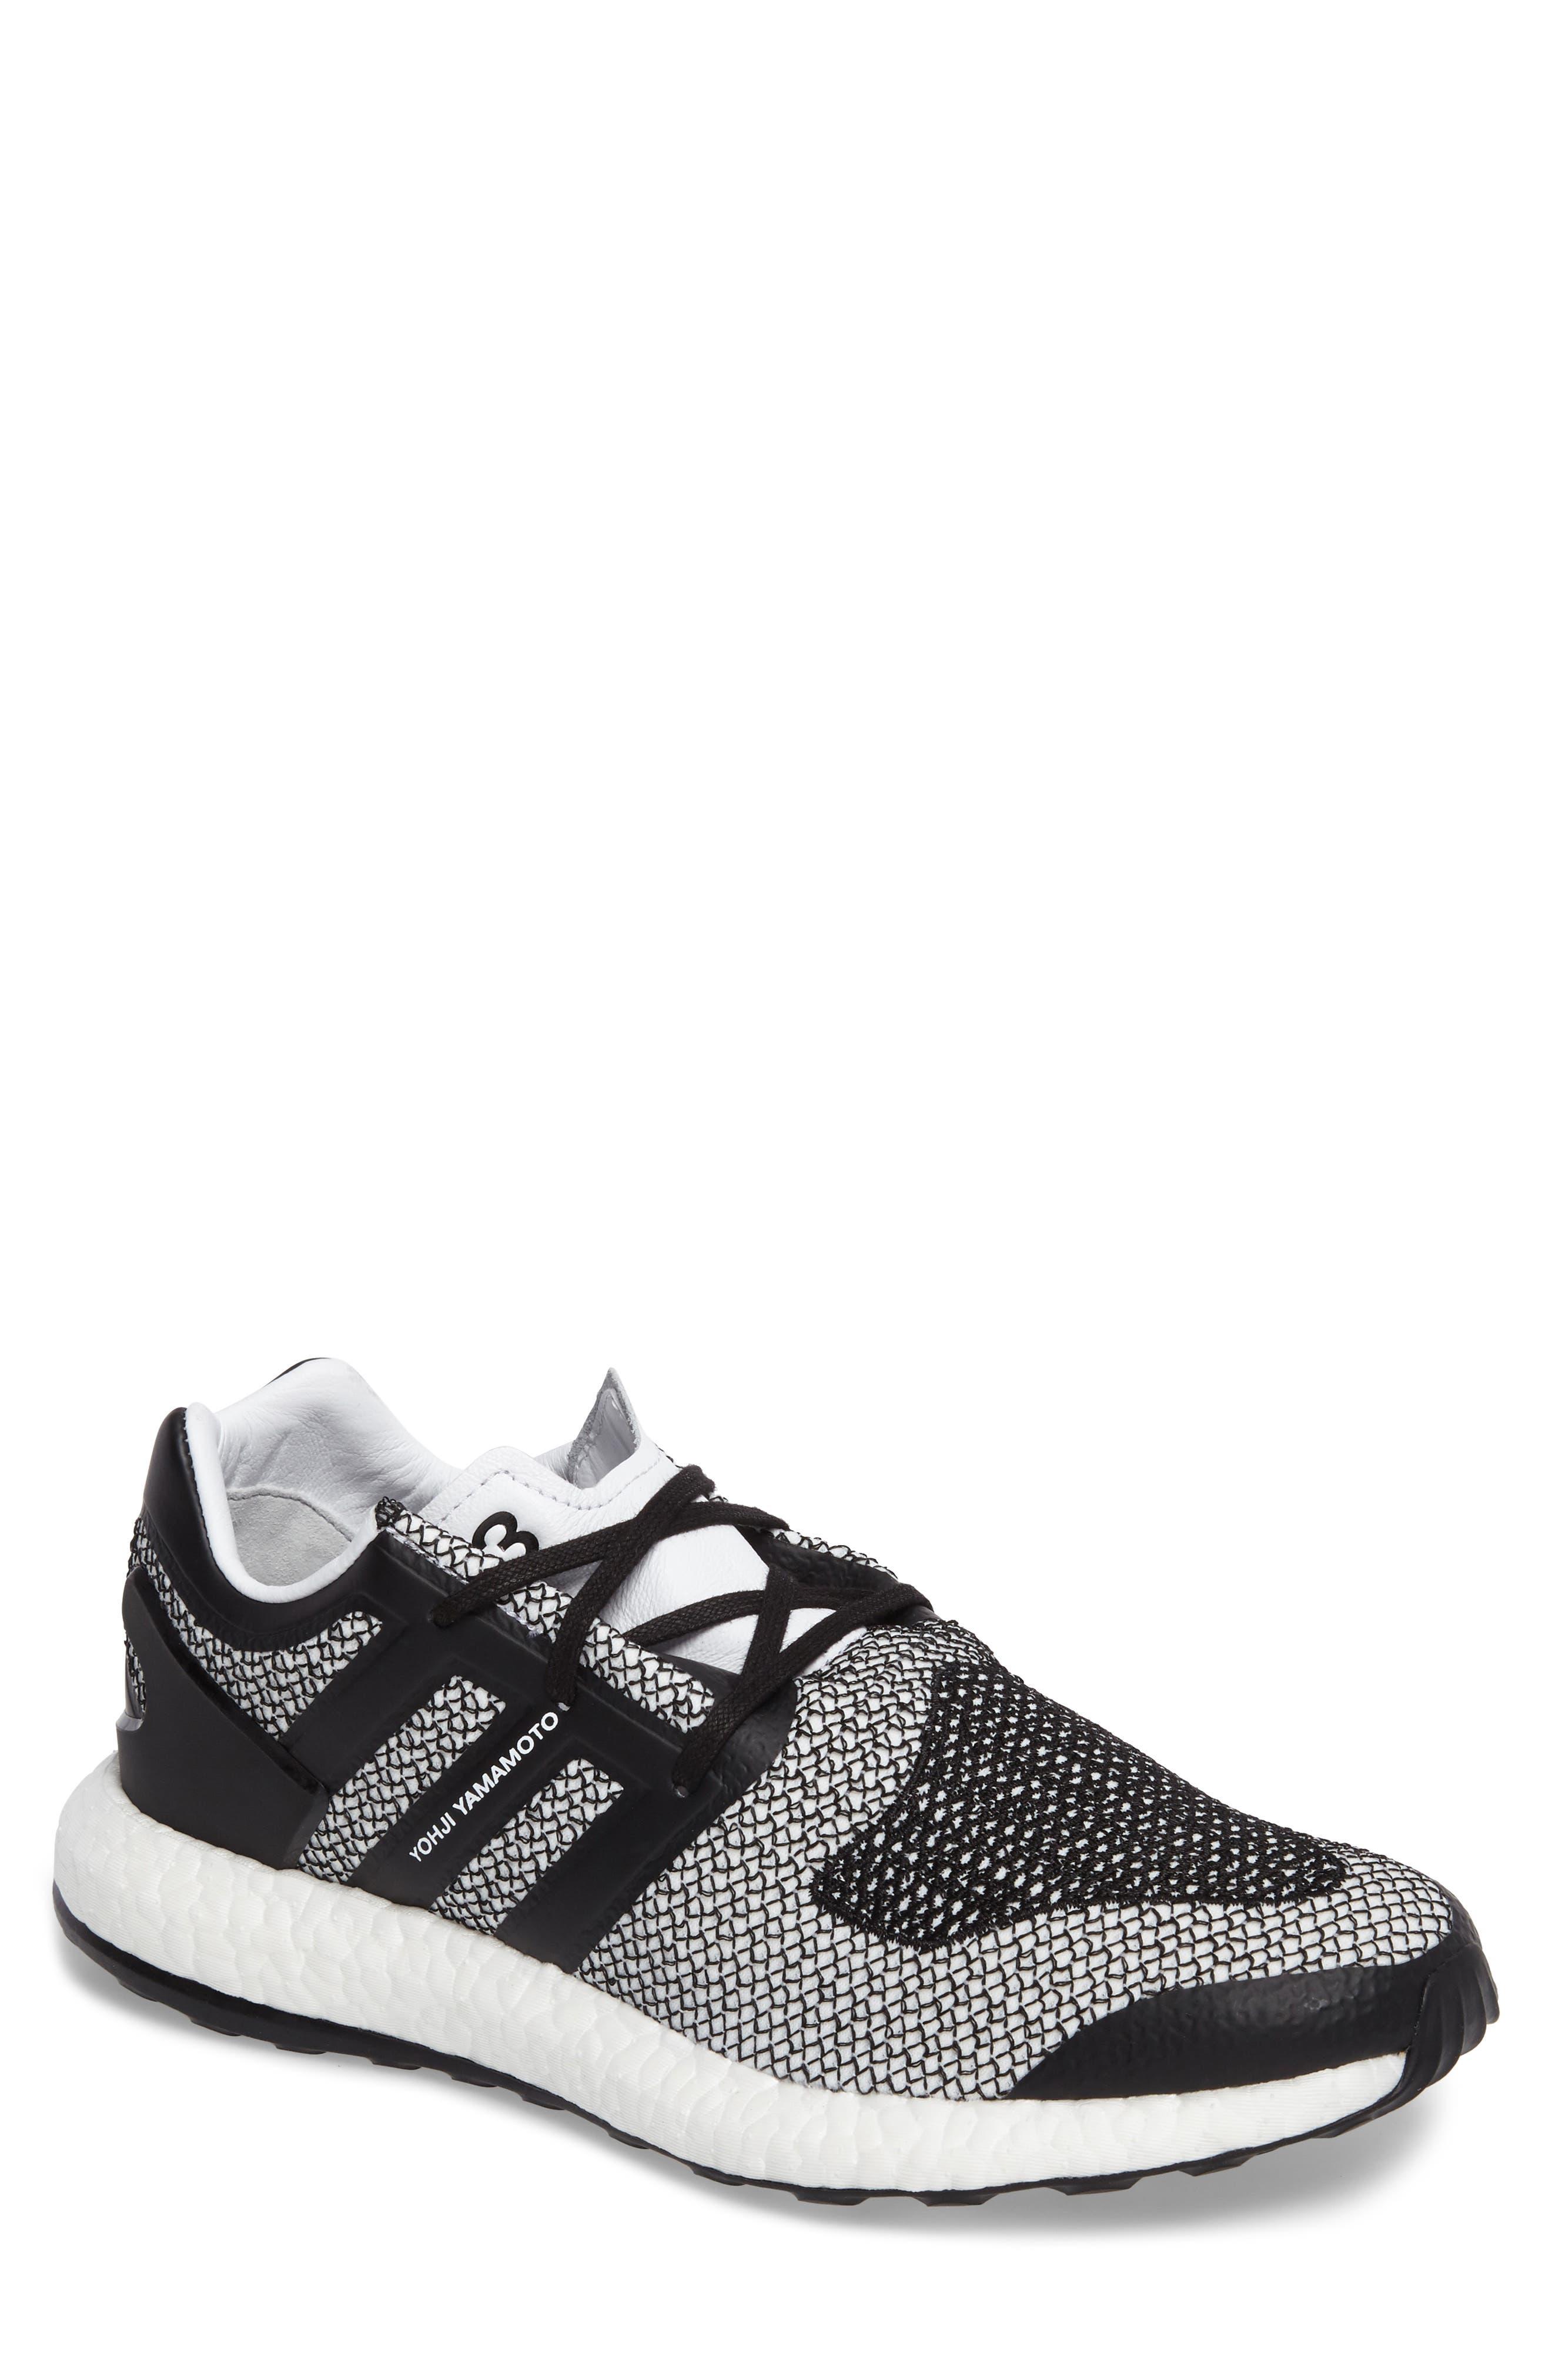 Y-3 Pureboost Sneaker (Men)